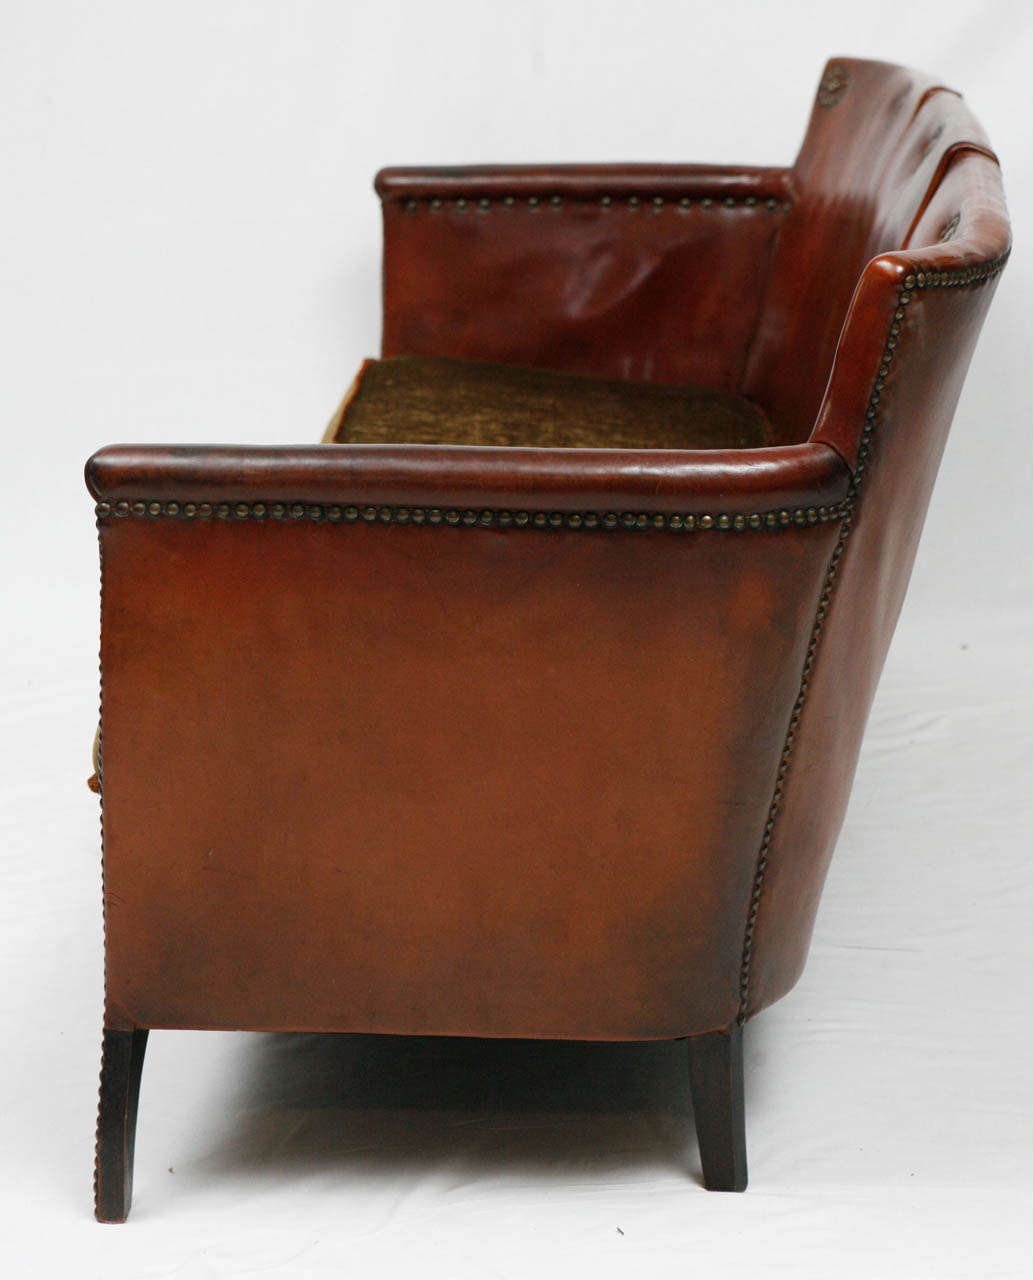 otto schulz sofa at 1stdibs. Black Bedroom Furniture Sets. Home Design Ideas